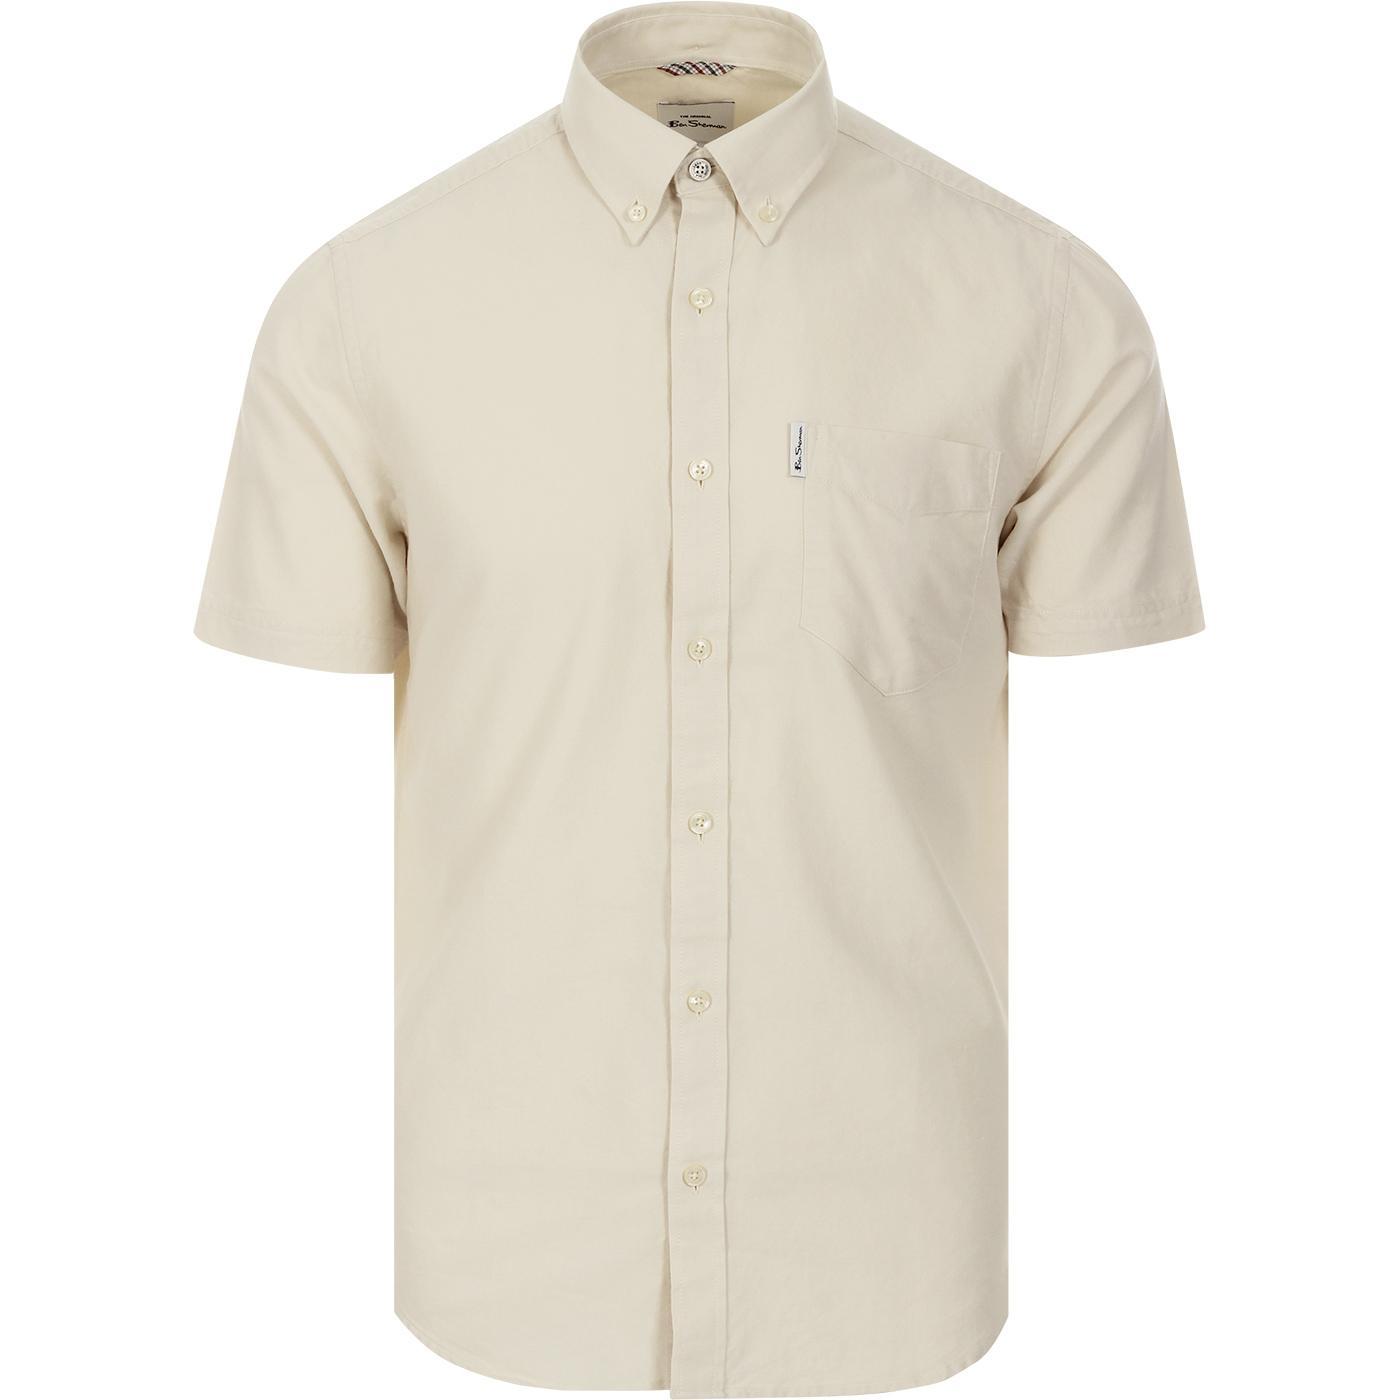 BEN SHERMAN 60s Mod SS Signature Oxford Shirt ECRU